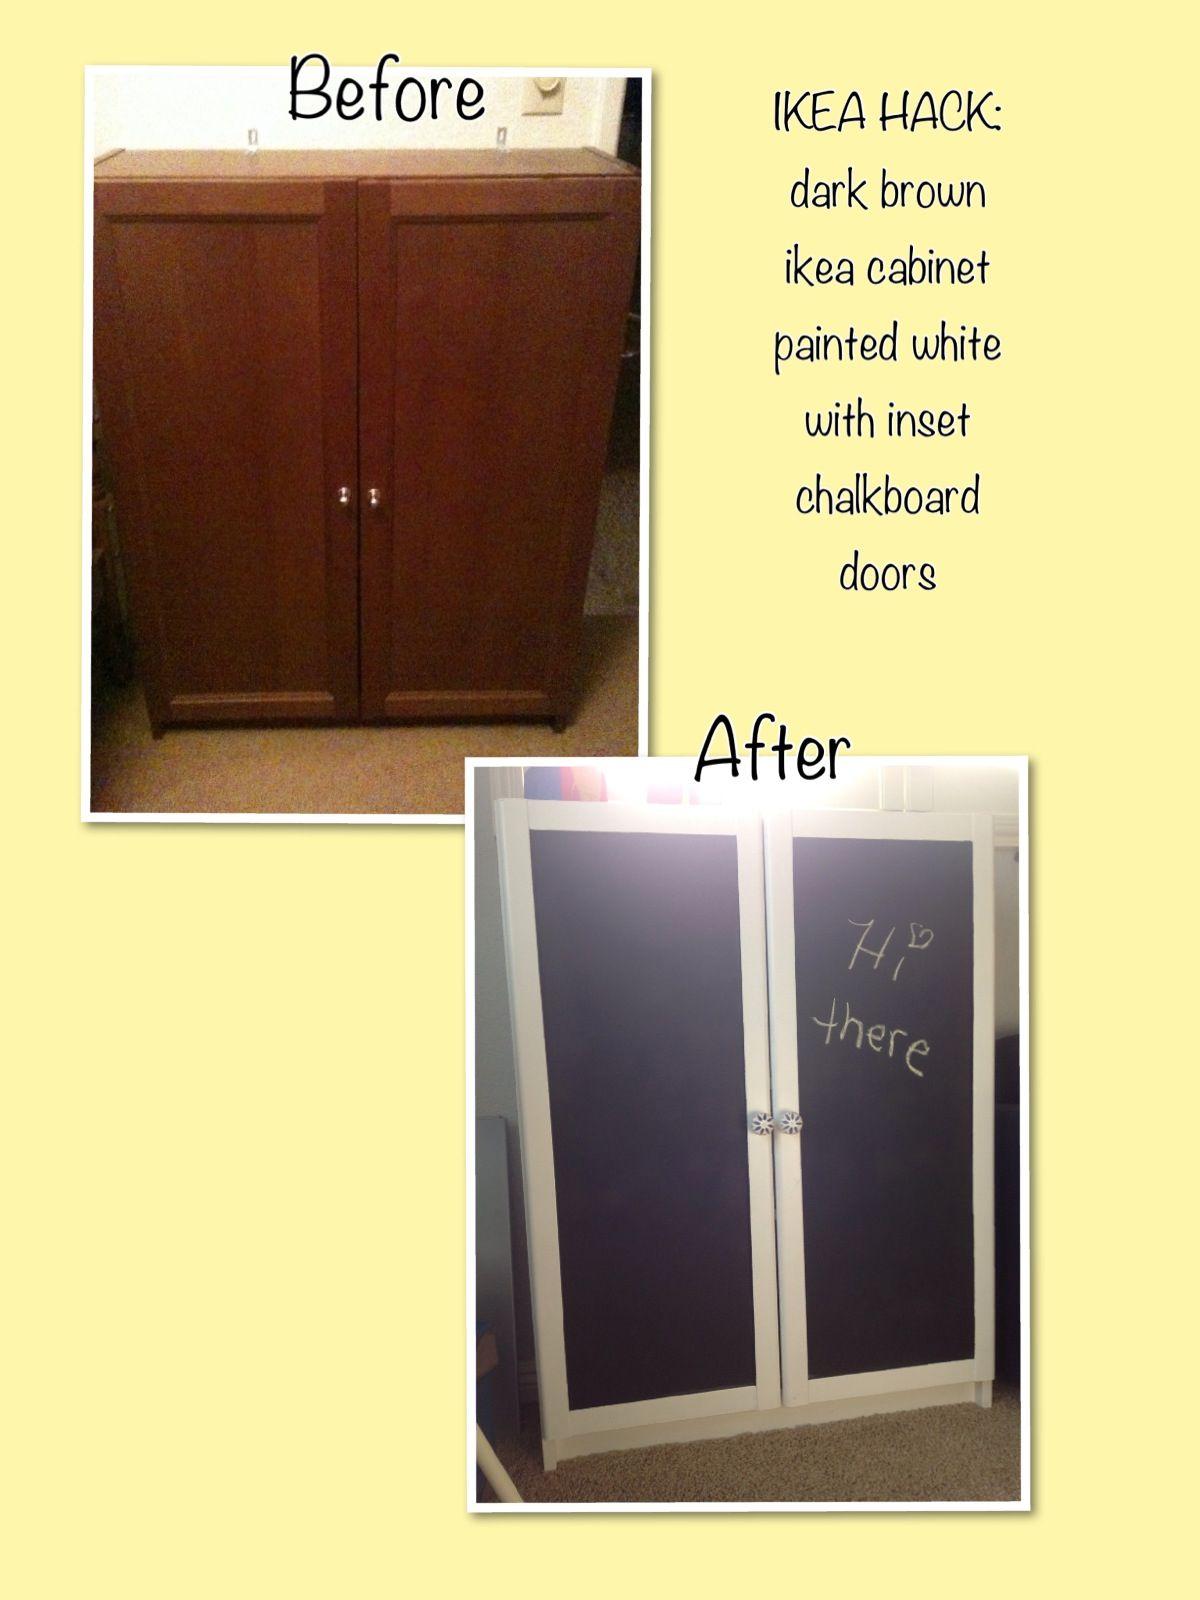 Ikea Hack Dark Brown Billy Bookcase With Doors White Semi Gloss Paint Black Chalkboard Ceramic S